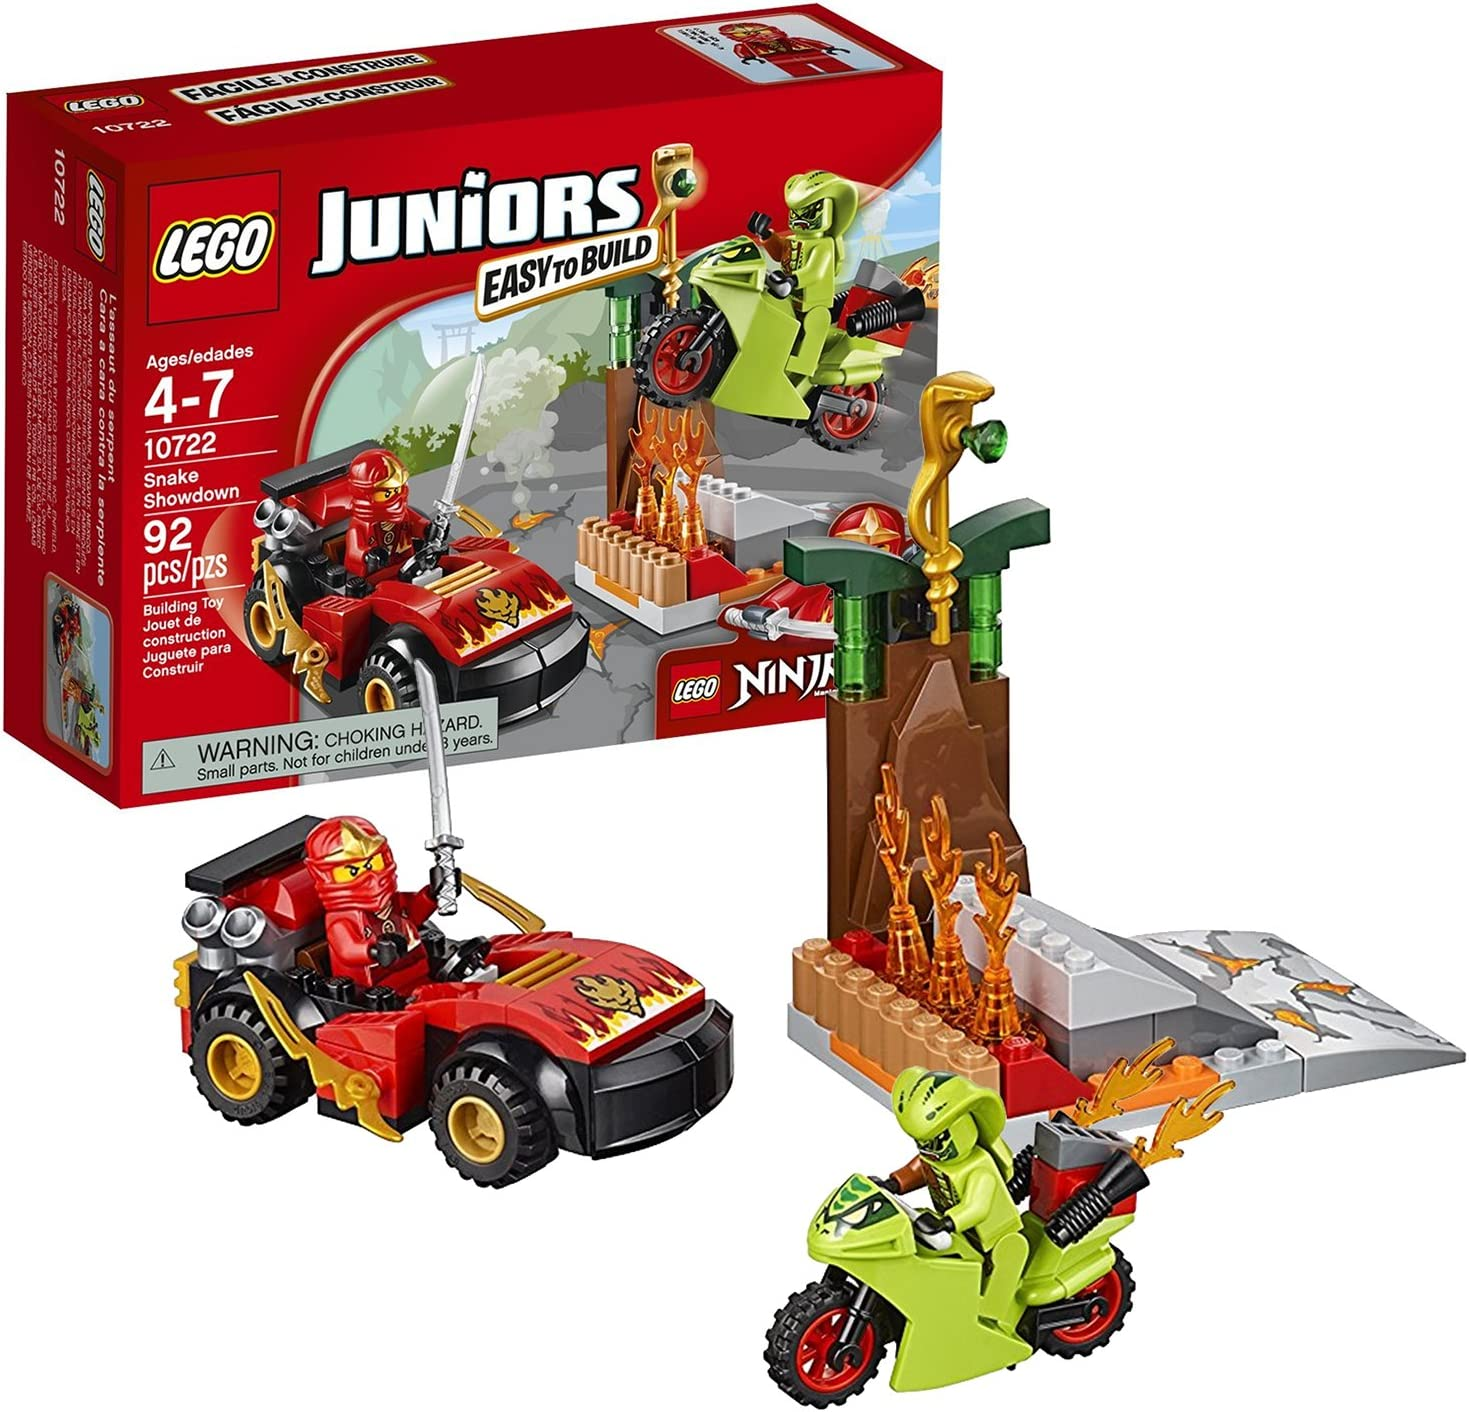 Lego Year 2016 Juniors Ninjago Series Set #10722 - SNAKE SHOWDOWN with Ninja Car, Motorbike Plus Kai and Lasha Minifigure (Pieces: 92)